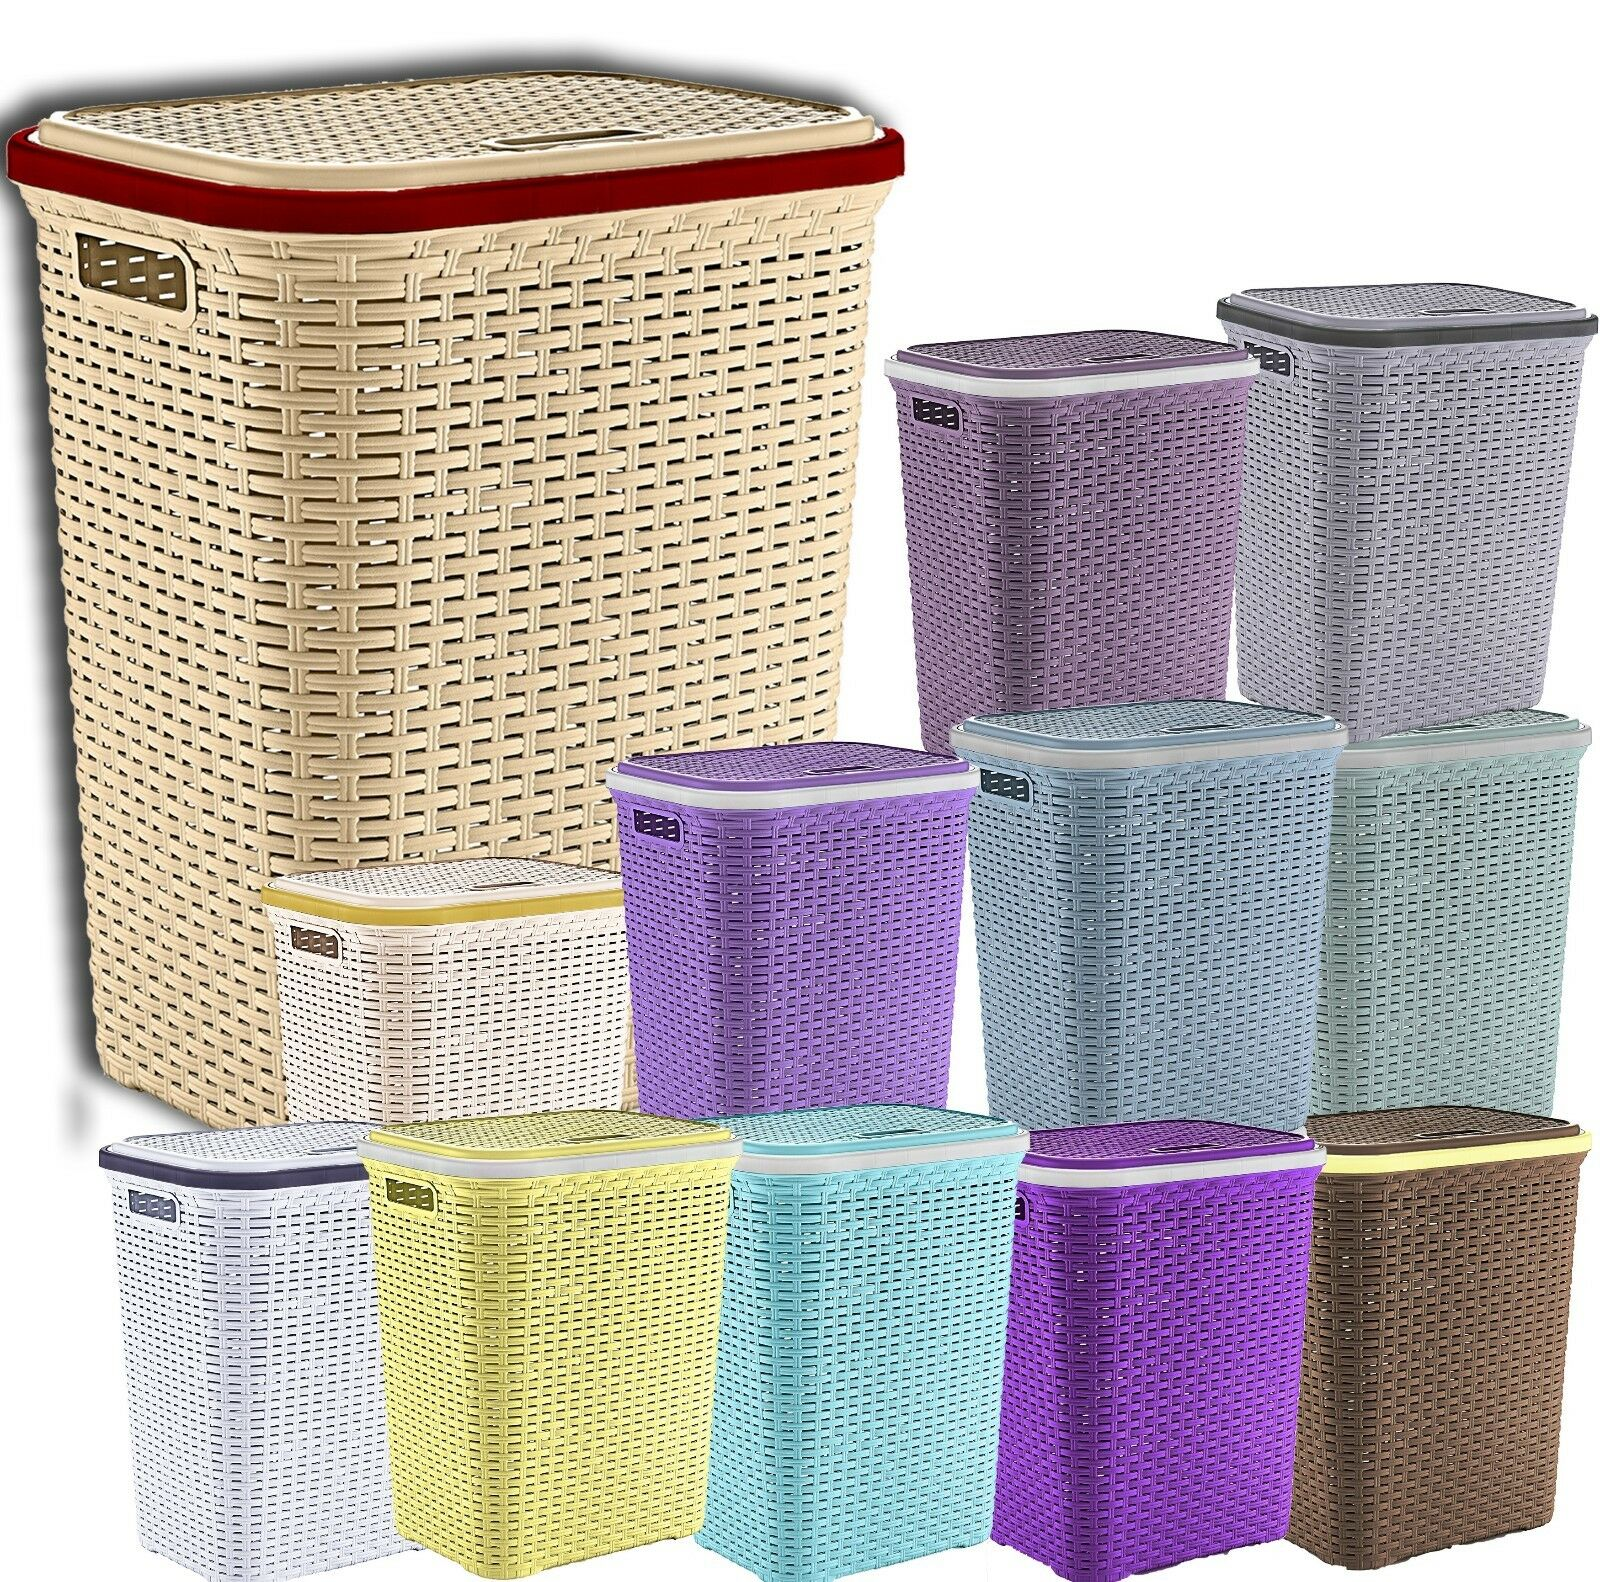 Plastic Rattan Laundry Basket Washing Clothes Storage Hamper Baskets Bin Bins